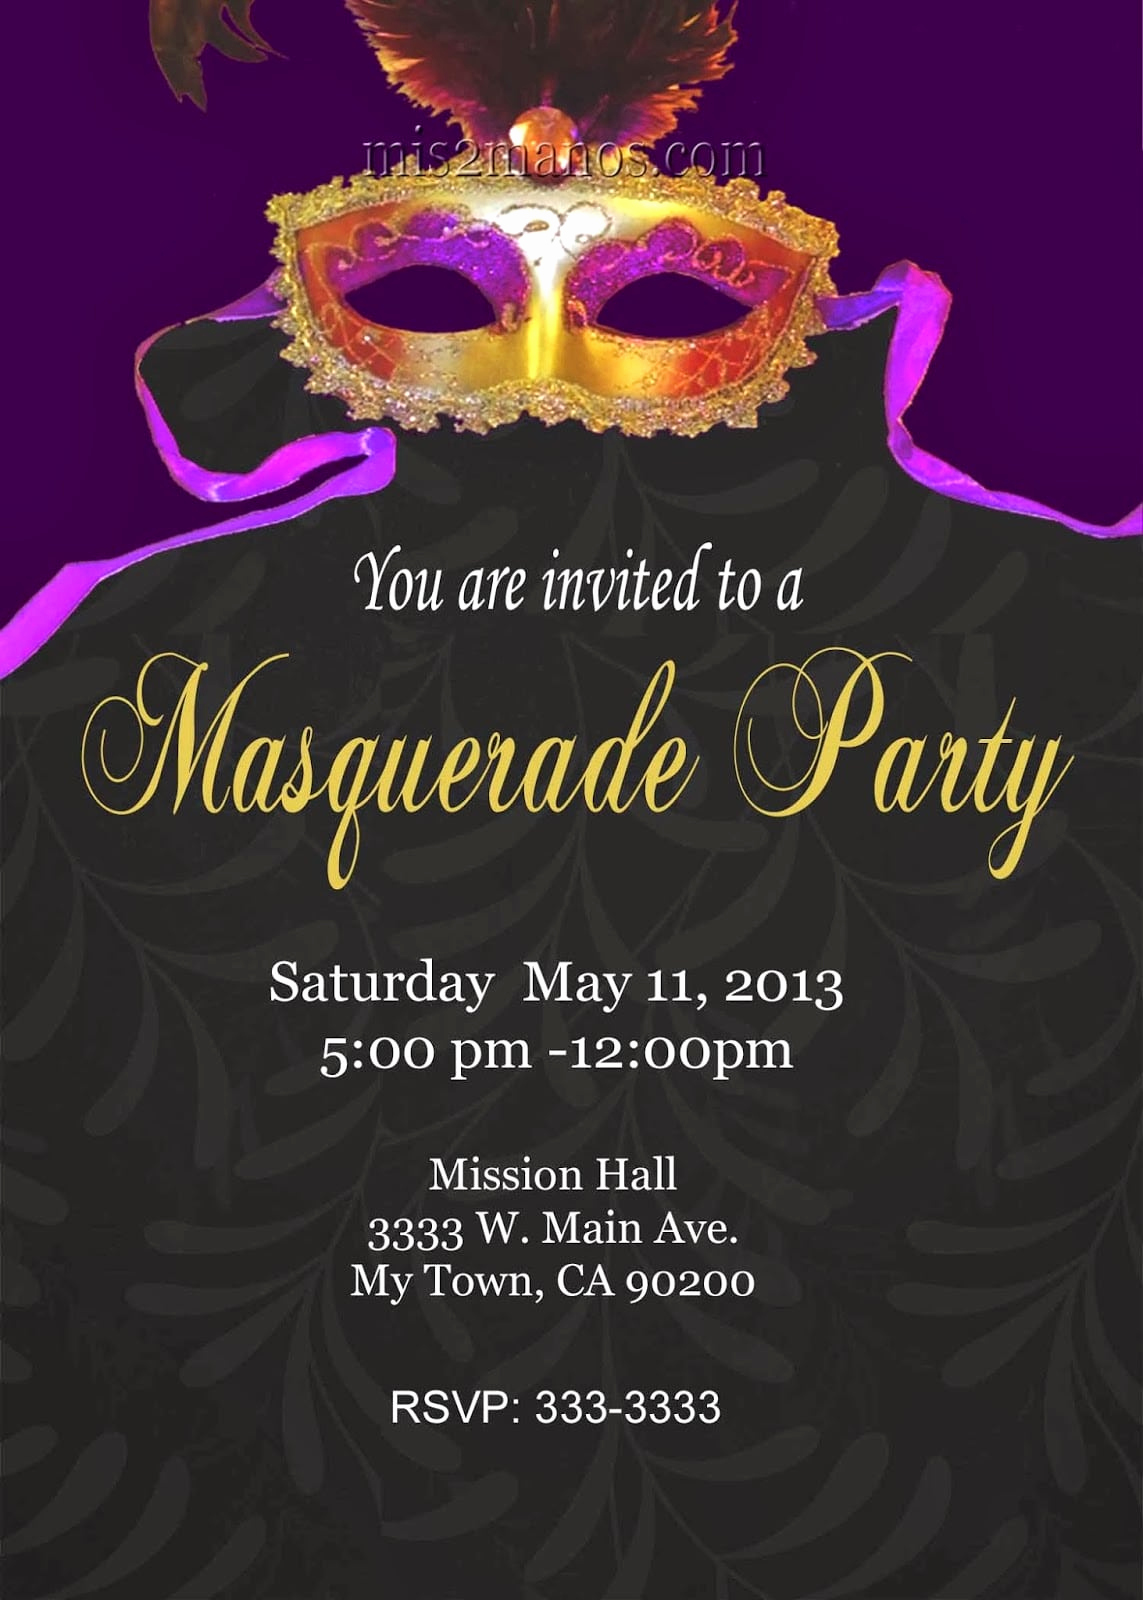 Mardi Gras Invitation Template Elegant Mardi Gras Invitation Free Printable